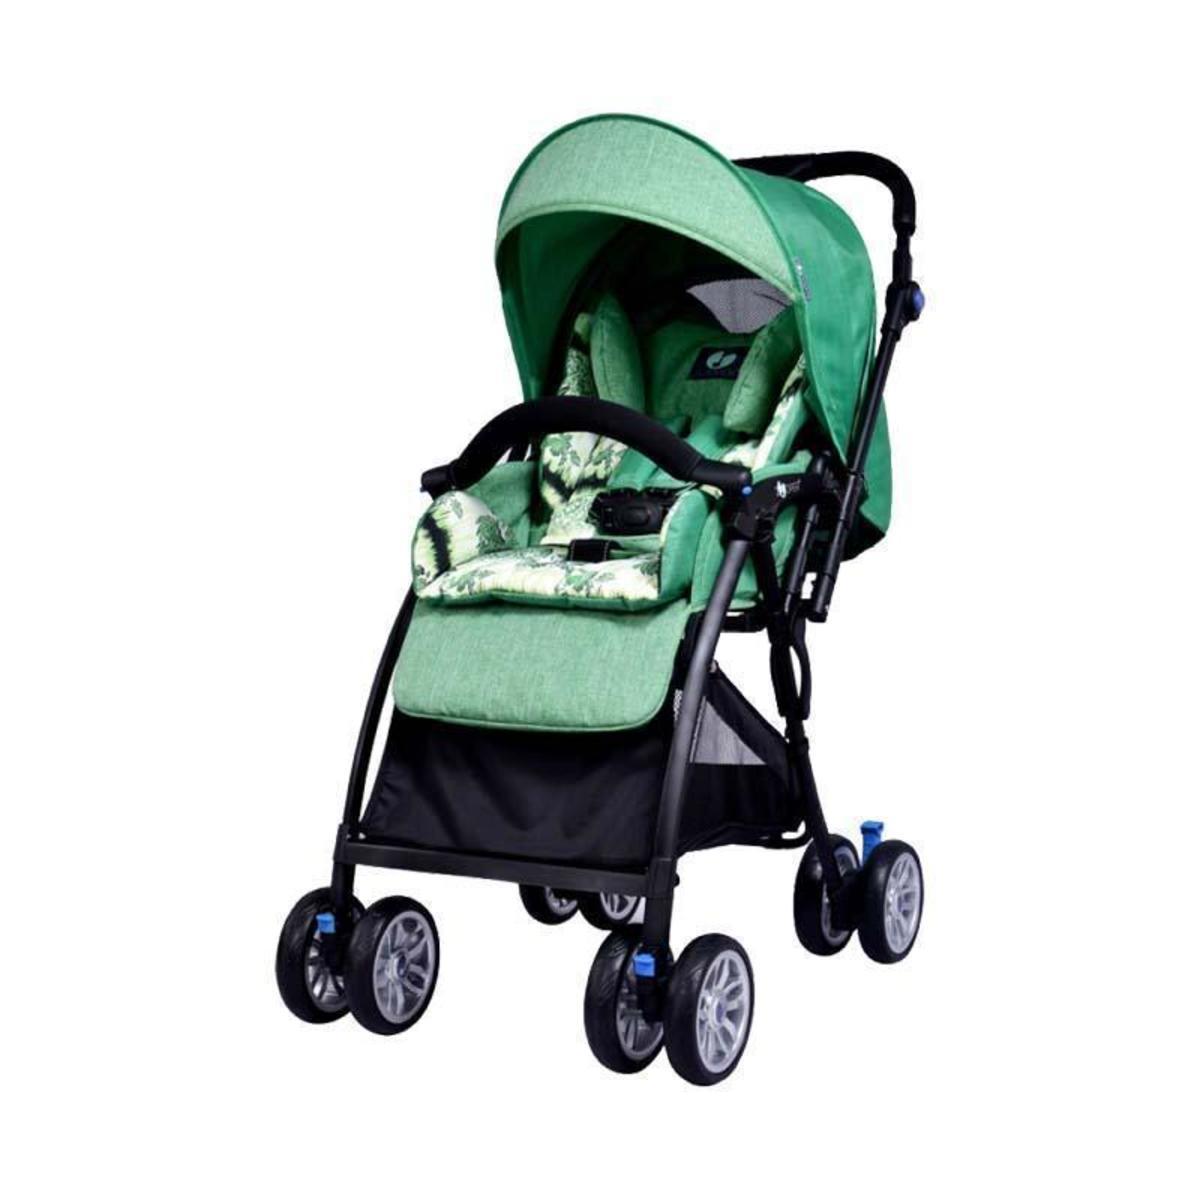 Zooper® Salsa2 All Weather Folding Stroller 0-36 Months American Brand - Green